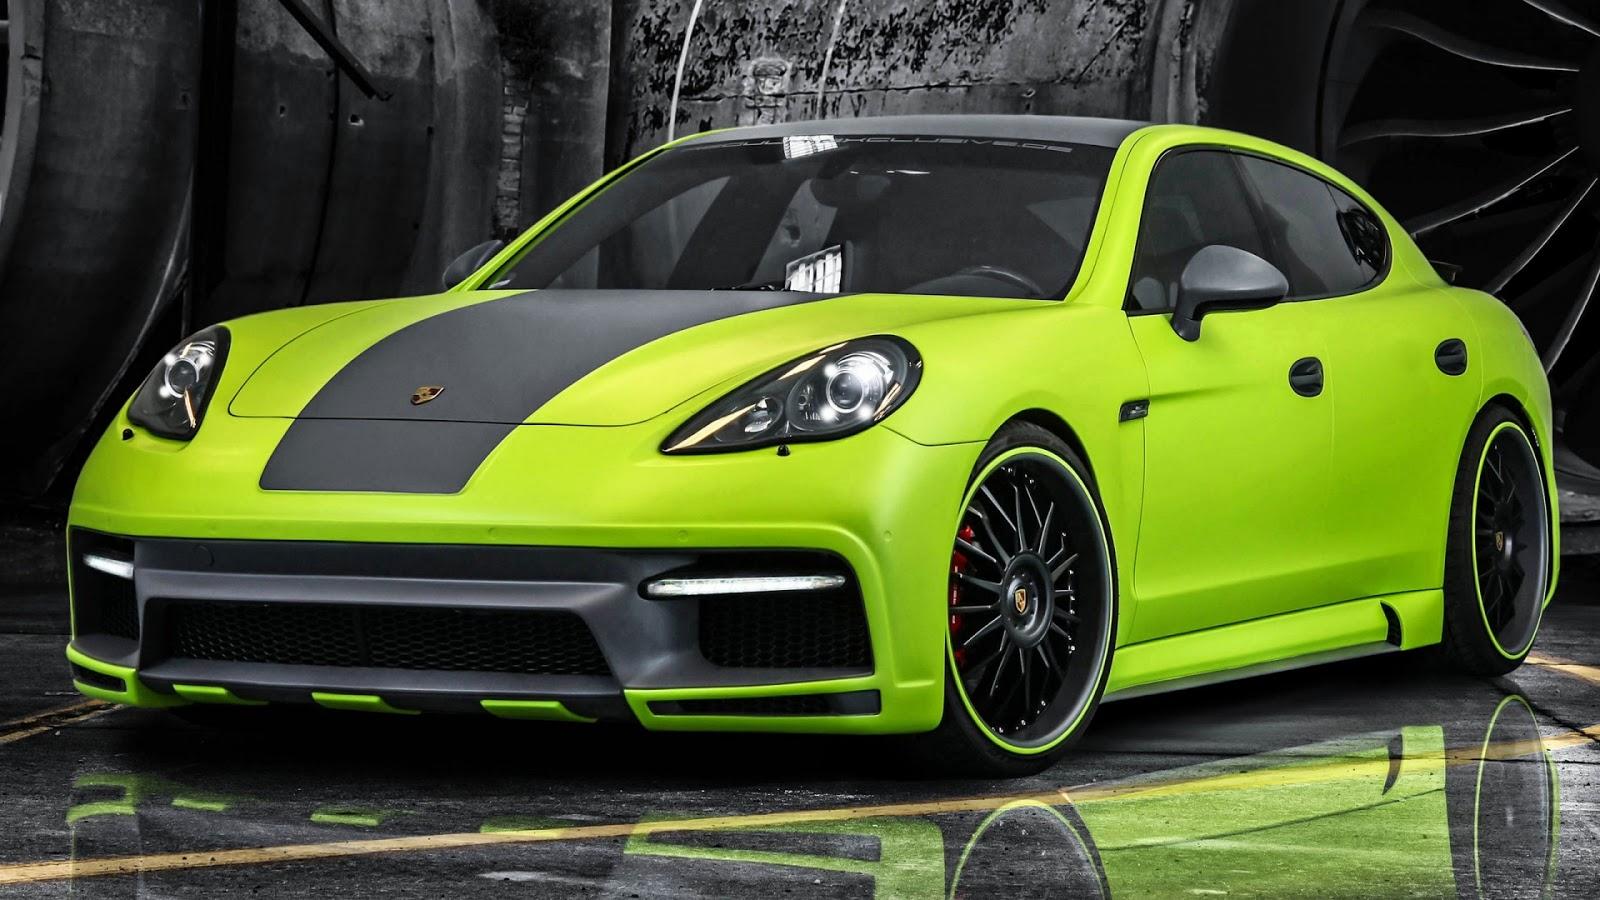 Porsche Panamera Green Full HD Desktop Wallpapers 1080p 1600x900